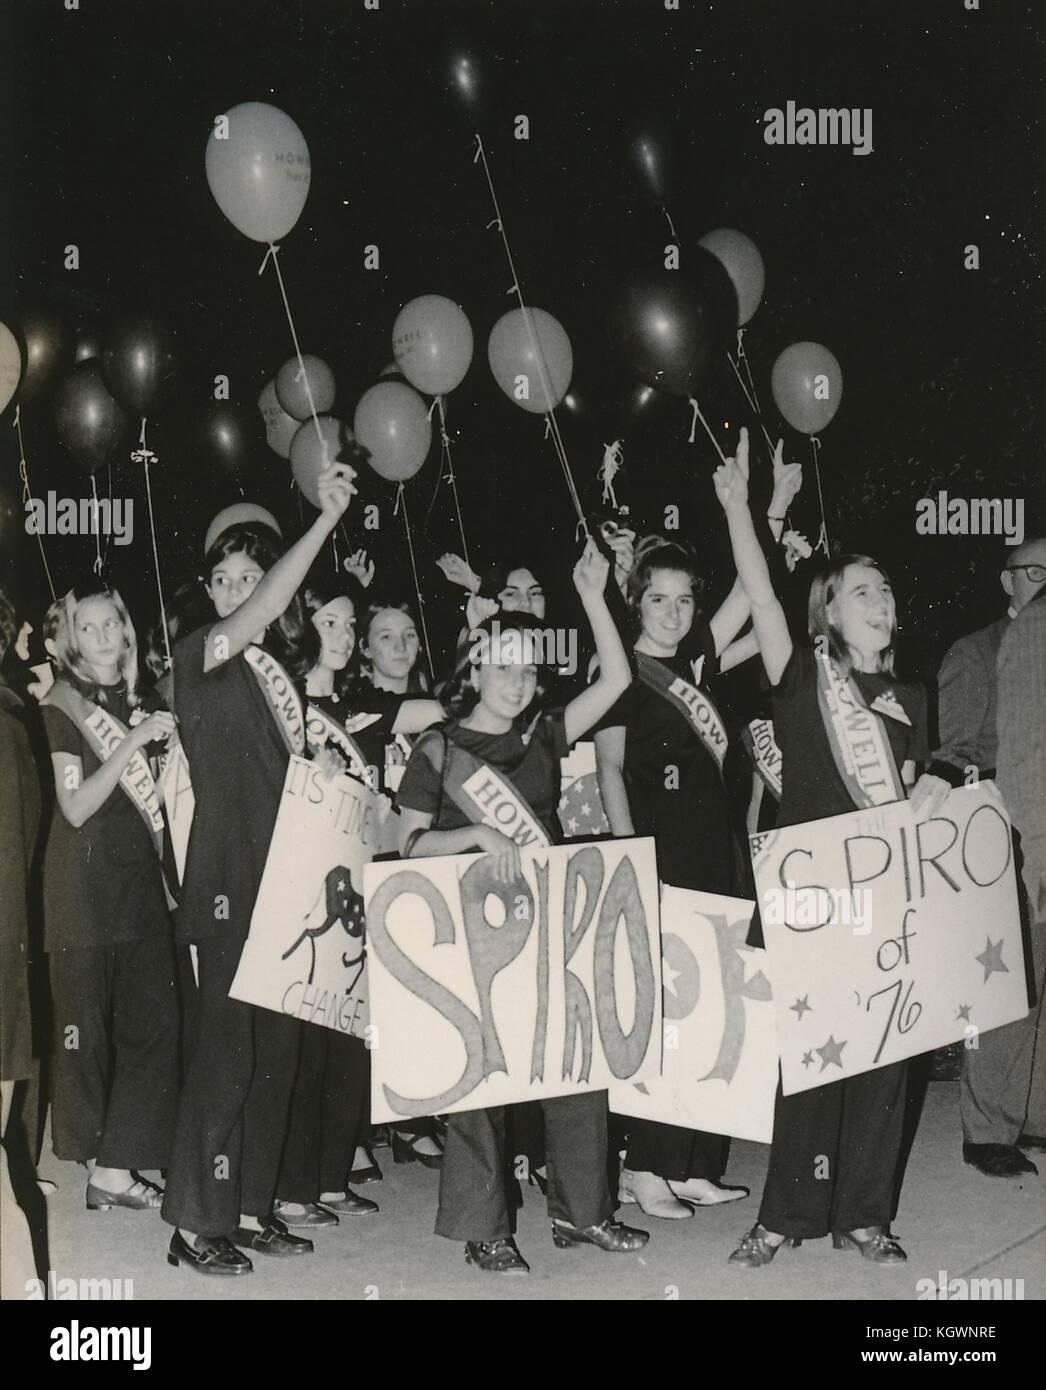 Students march at North Carolina State University, Raleigh, North Carolina holding signs reading 'Spiro of 76', - Stock Image